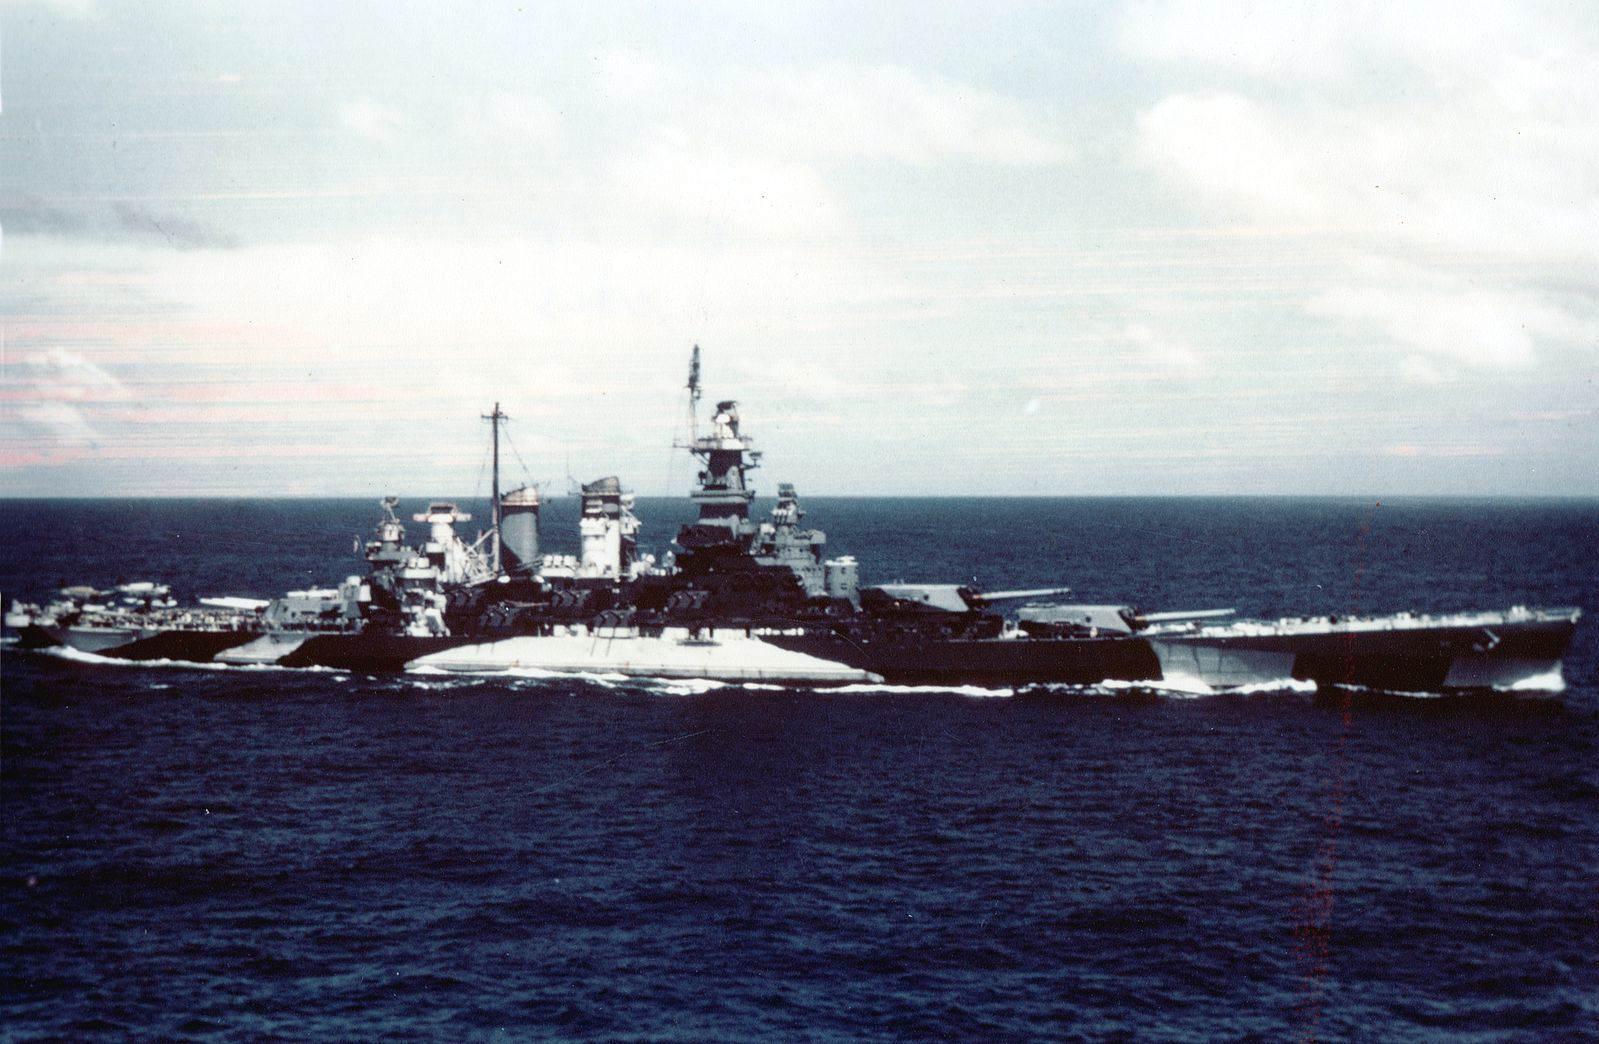 USS North Carolina (BB 55) underway in the Gilbert islands, November 1943 - Le BB55 North Carolina lors de l'opération aux Gilberts en 1943, avec son camouflage